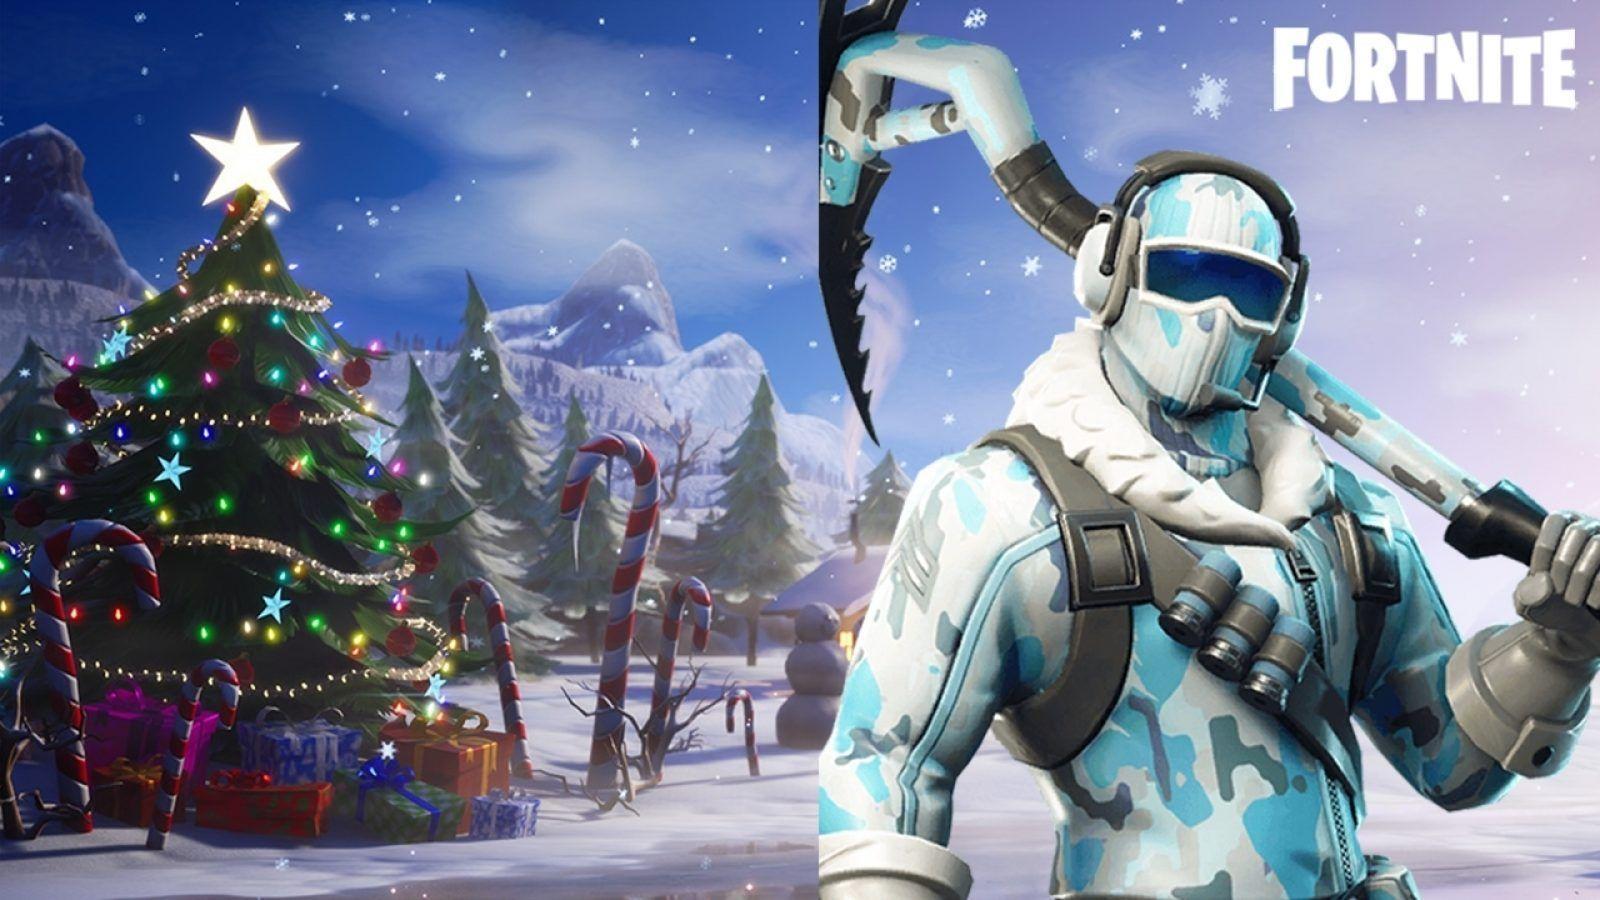 Christmas Update Fortnite Desktop Wallpapers Top Free Christmas Update Fortnite Desktop Backgrounds Wallpaperaccess